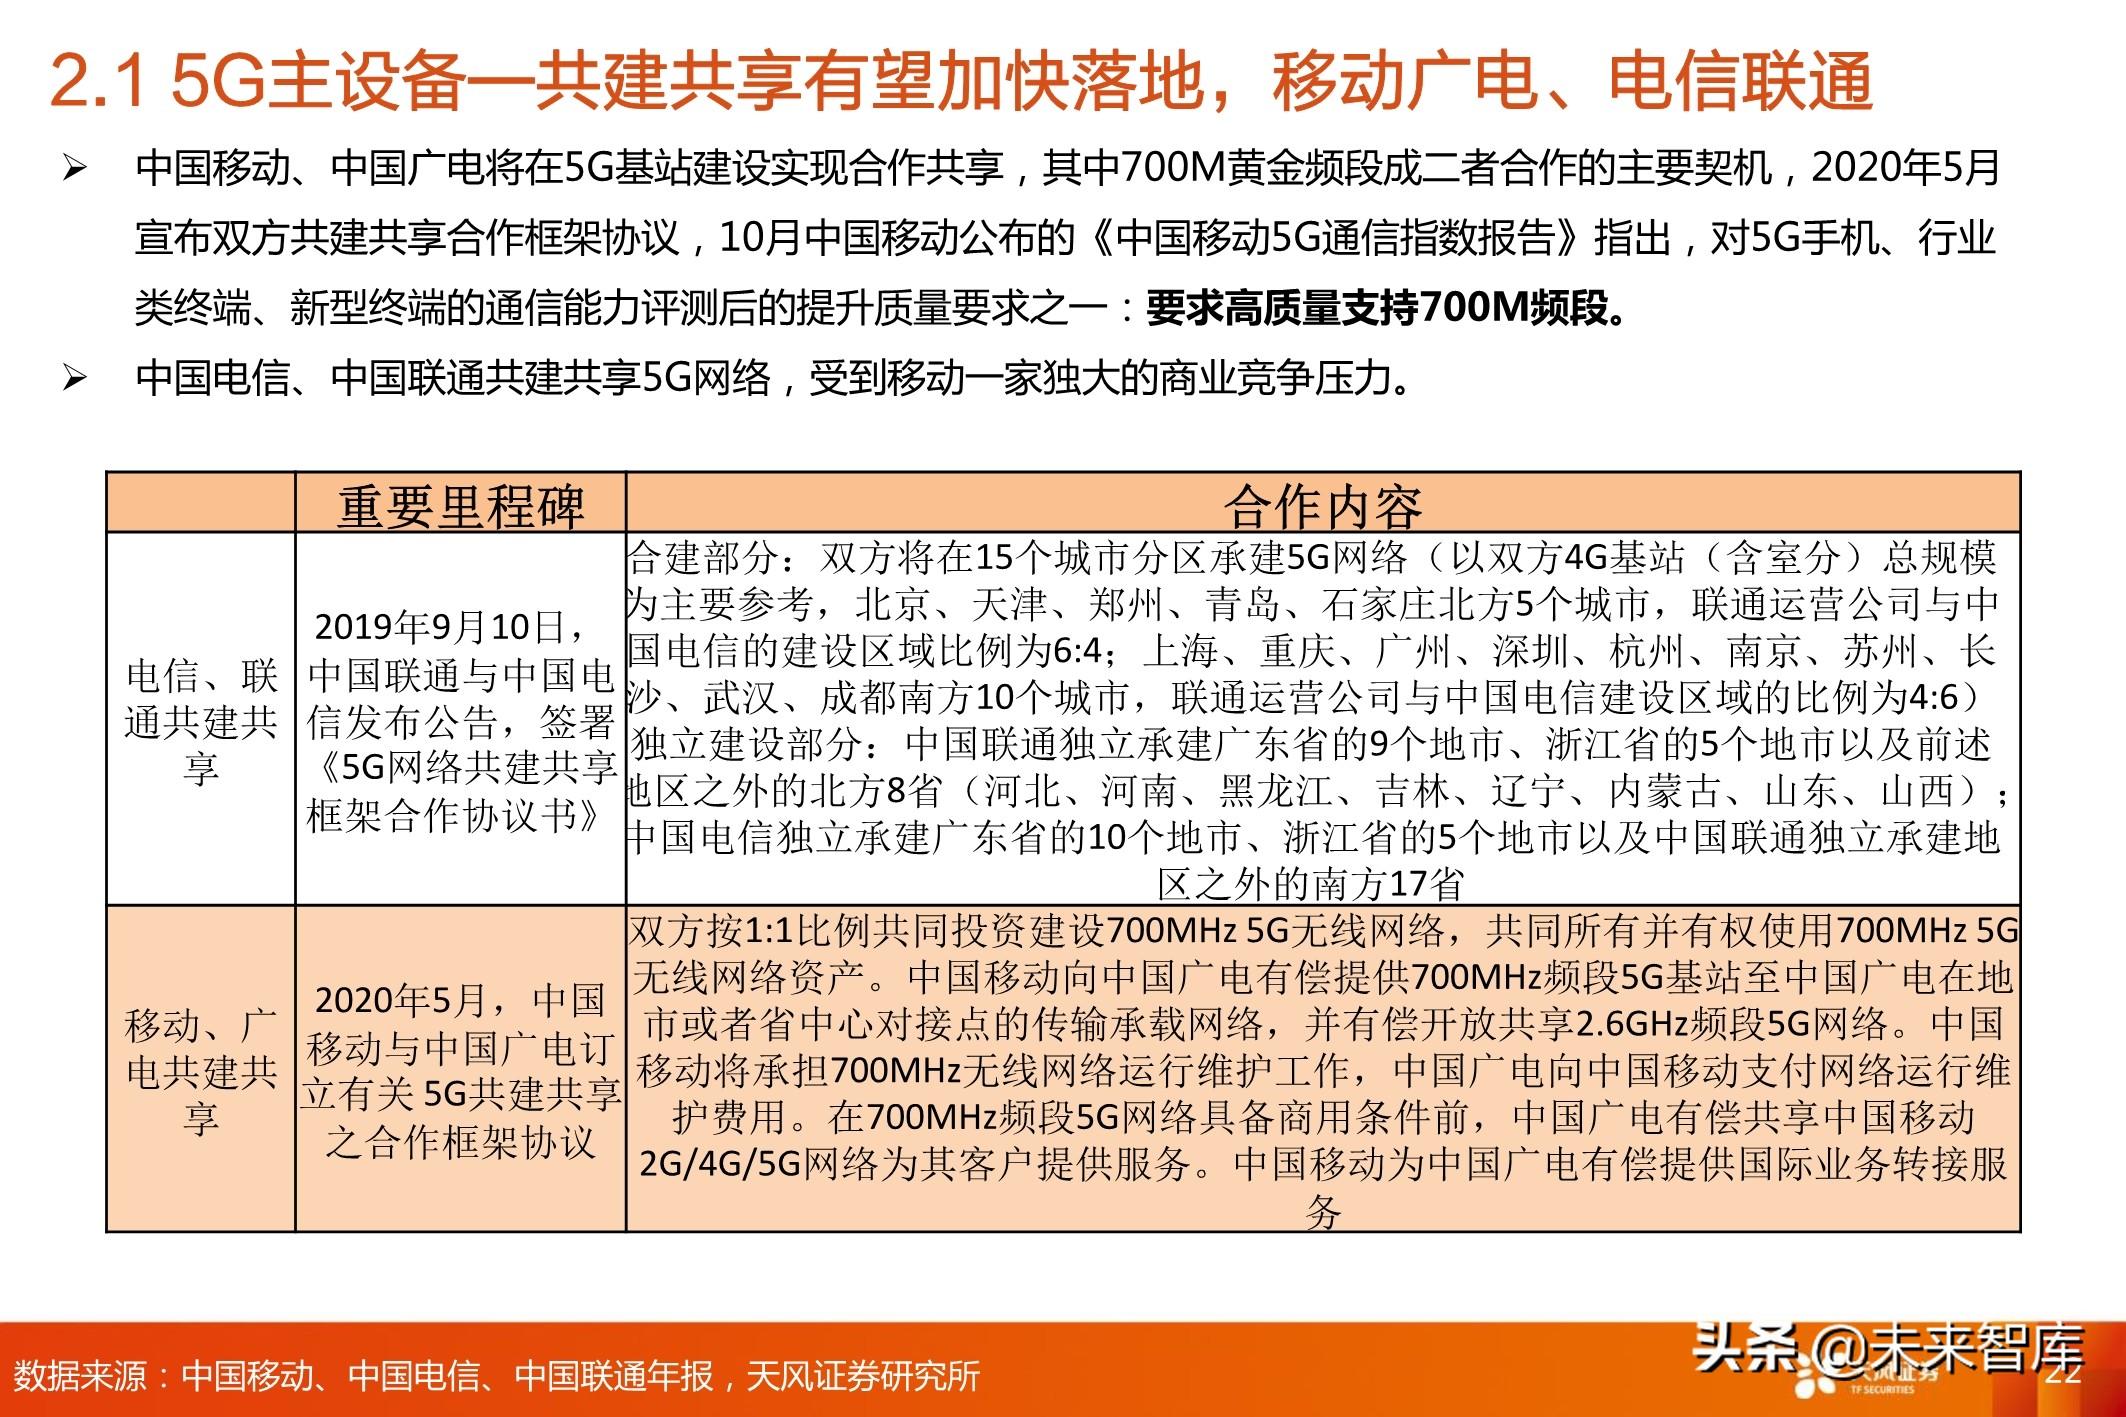 5G通信行业三大投资主线:5G网络+5G应用+云计算